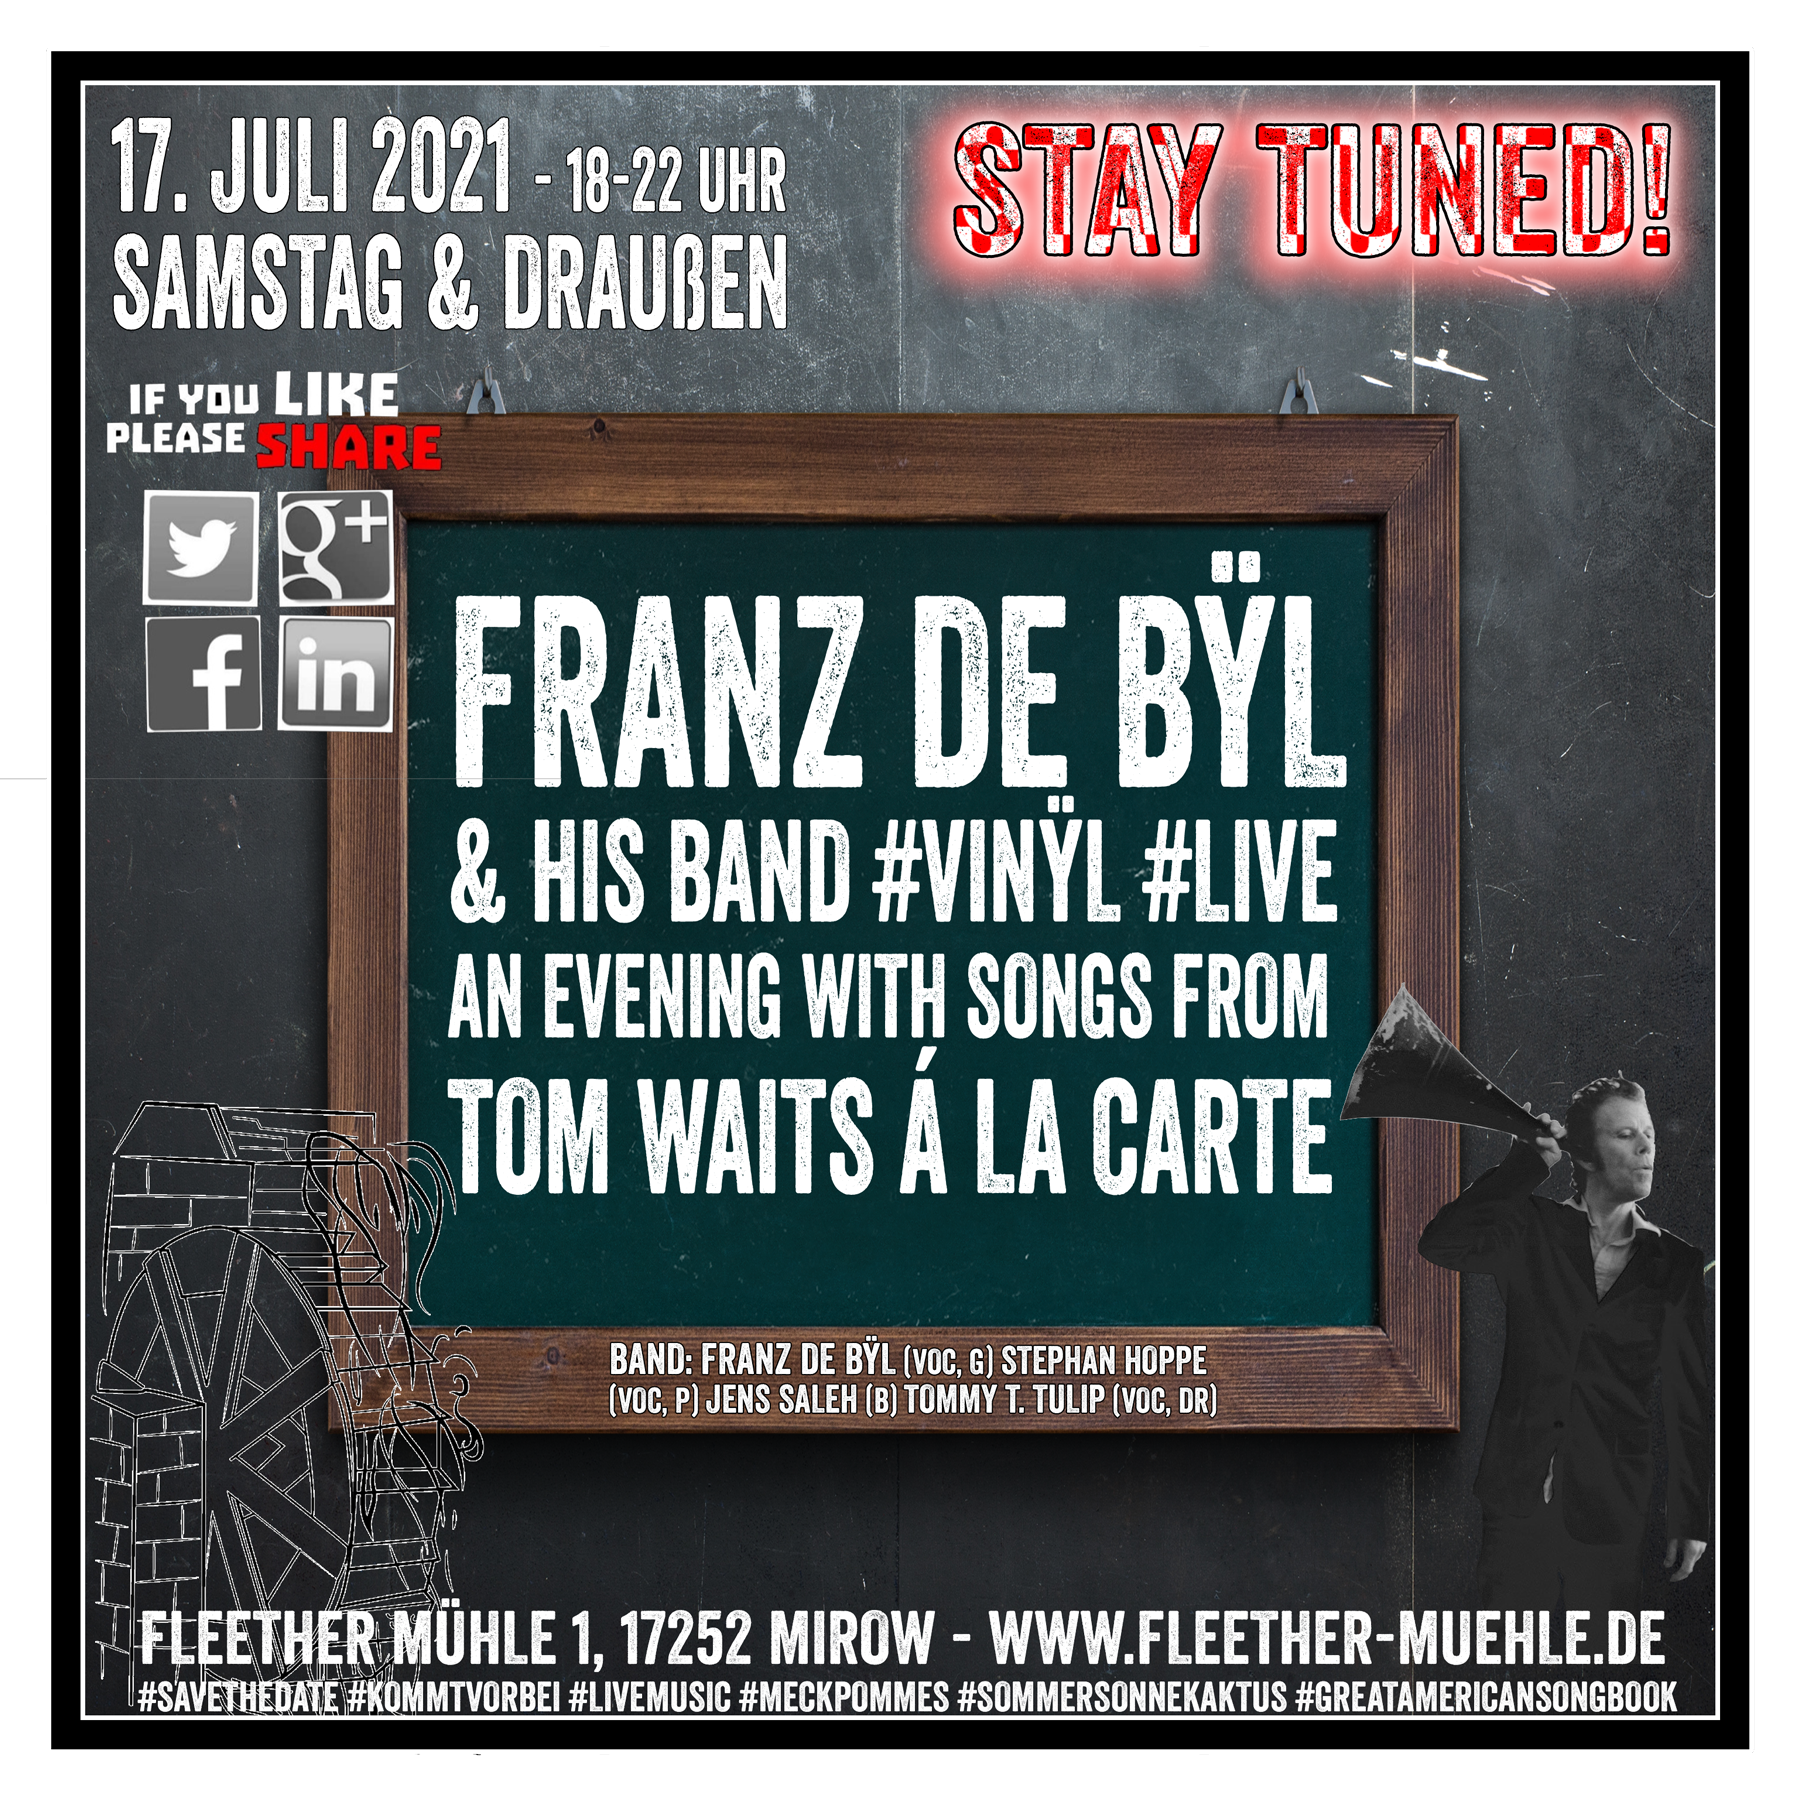 17.07.2021 - An Evening with Tom Waits á la carte #fleethermühle #tomwaitsalacarte #liveonstage #Tulipstagram #TTT